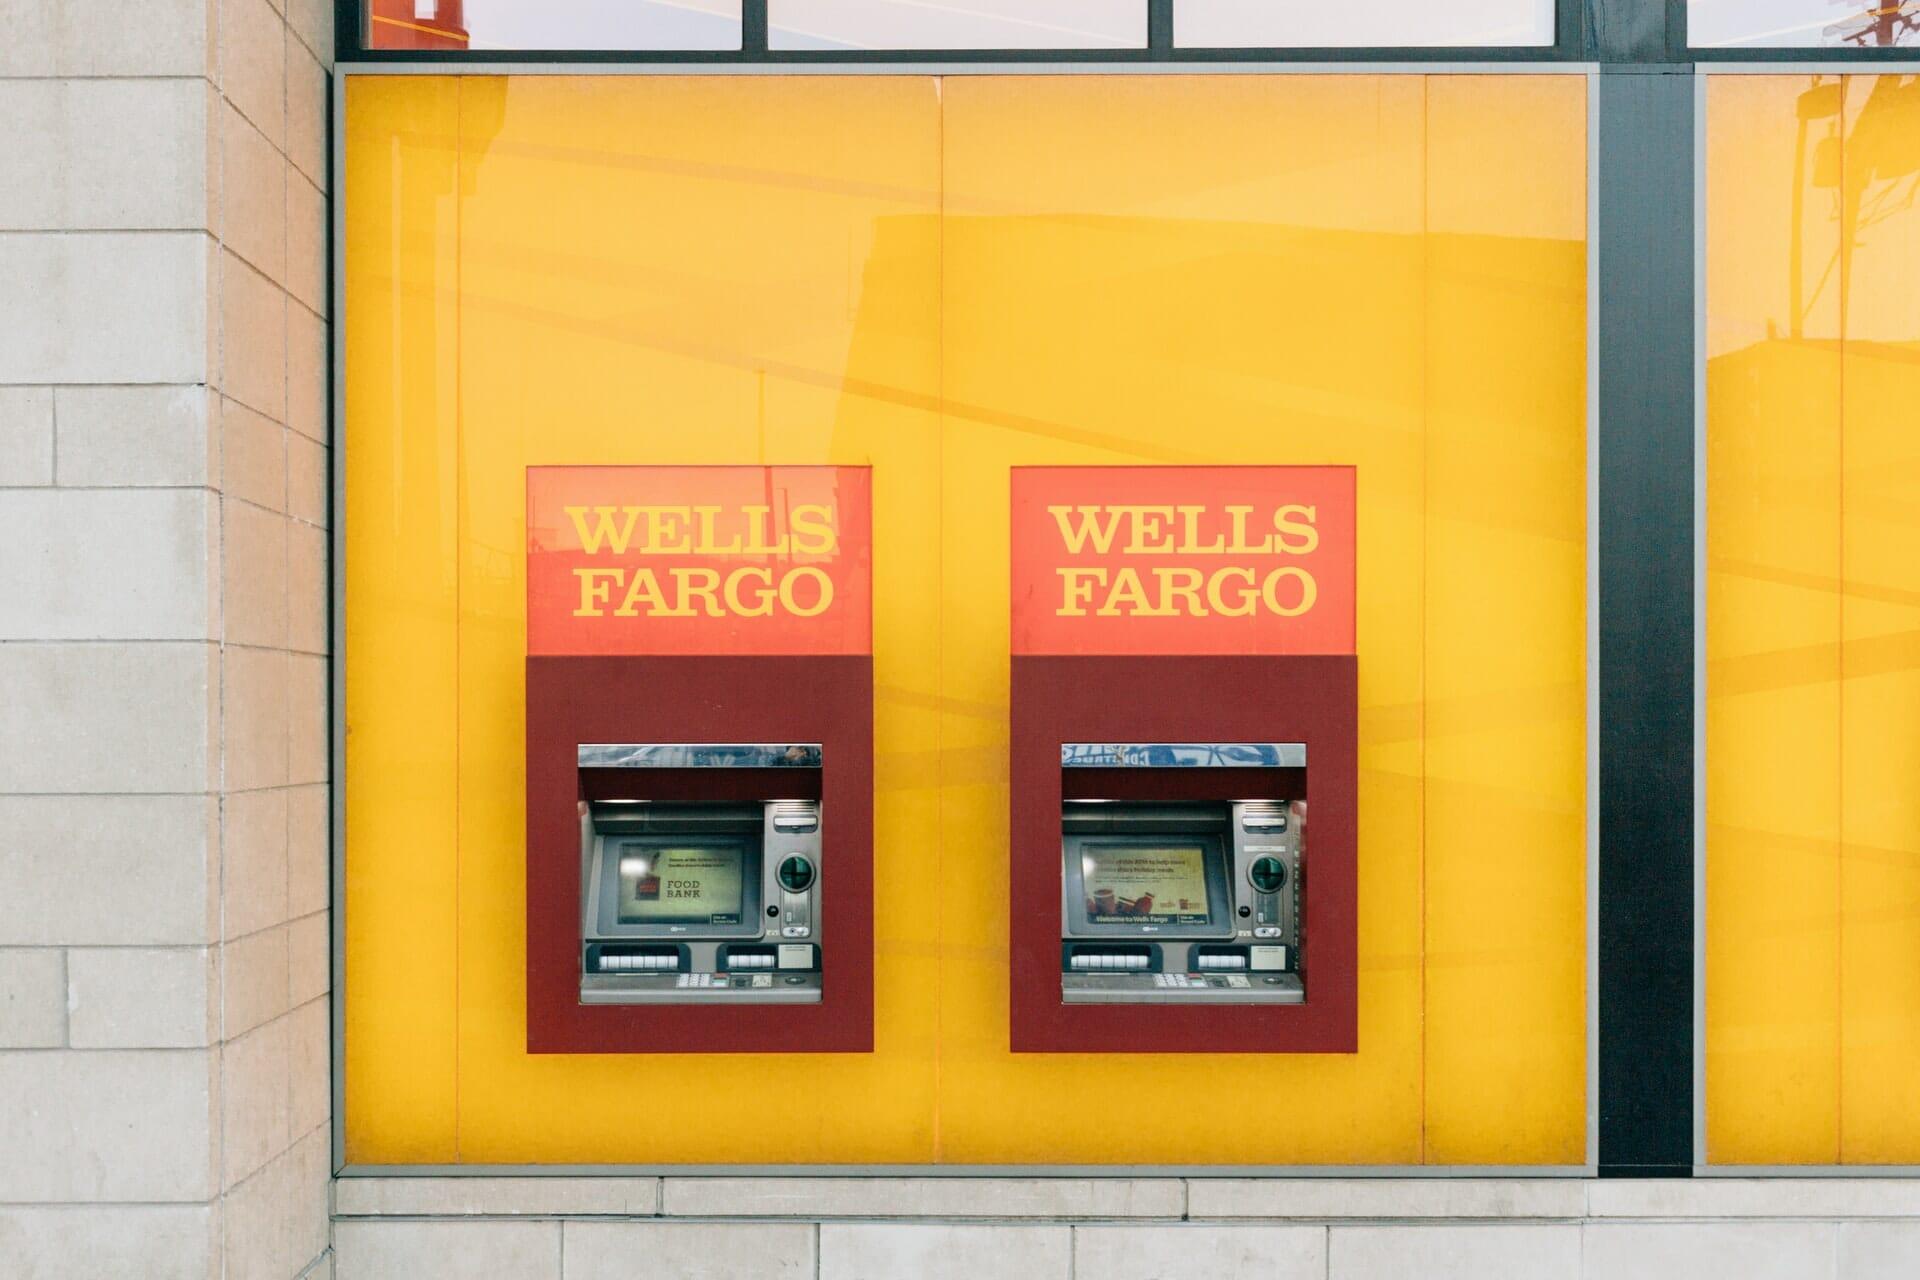 Wells Fargo Announces New Active Cash Cards